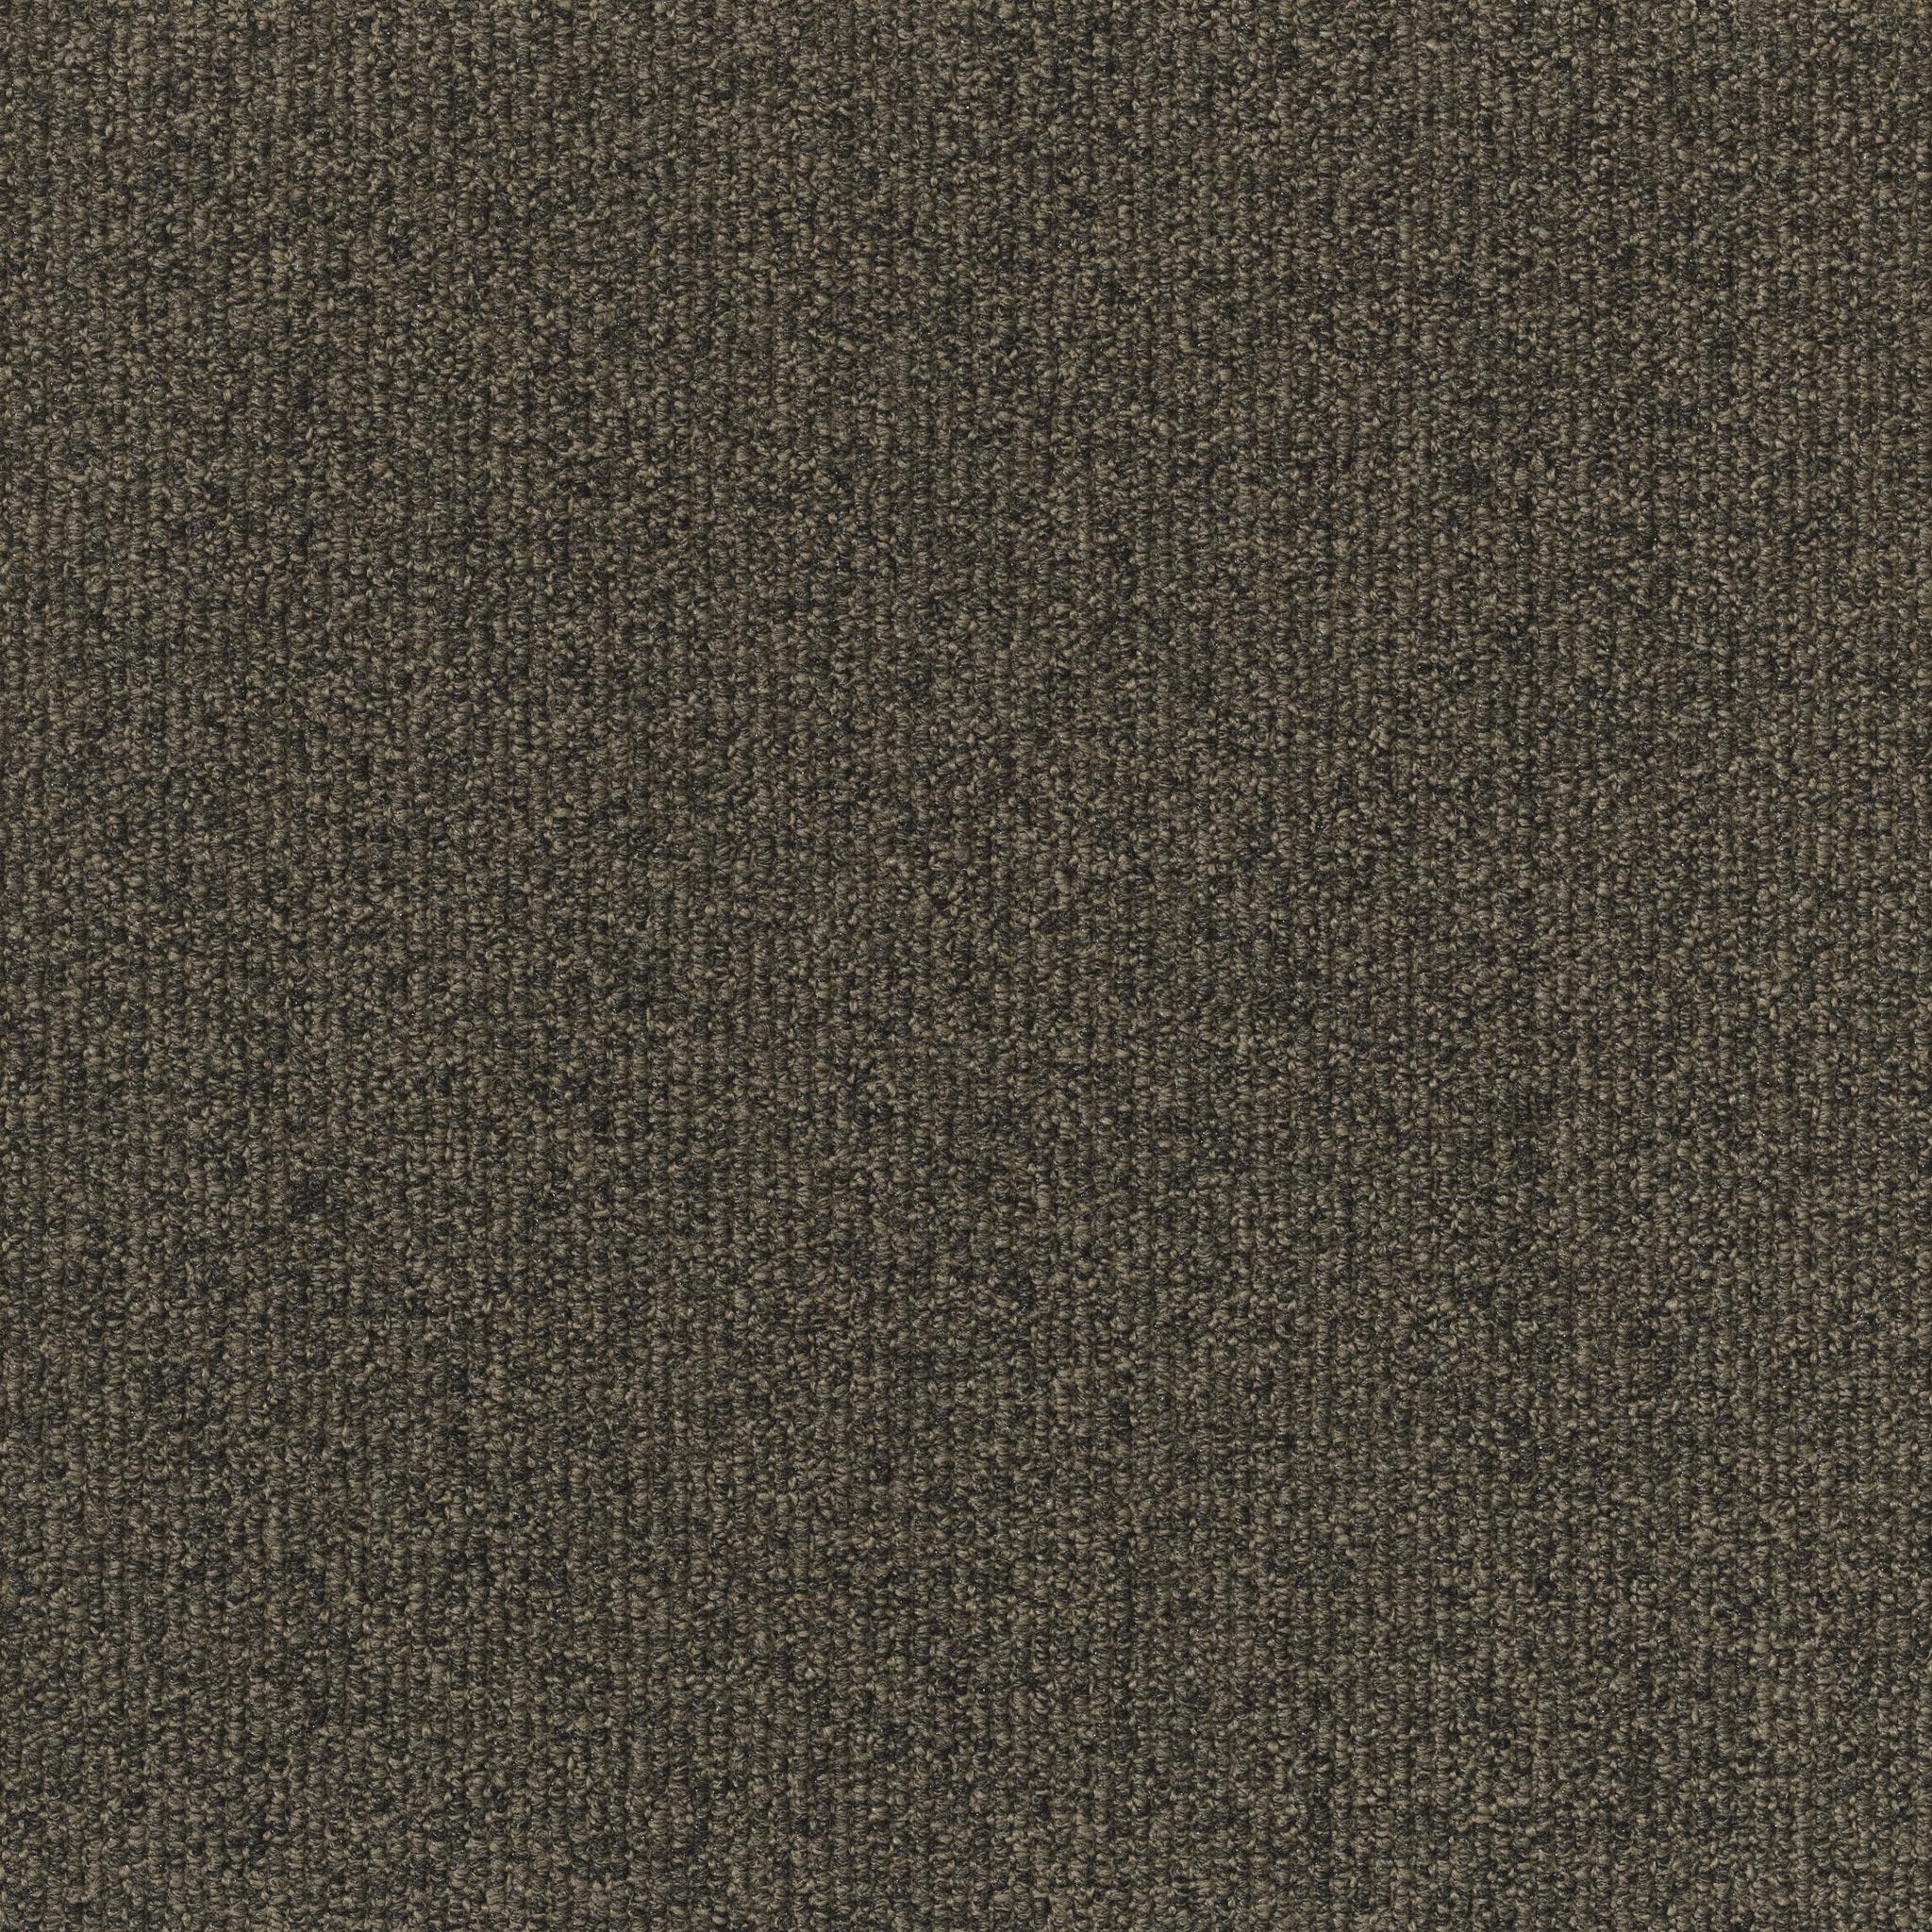 J J Carpet Tile Warranty Carpet Vidalondon